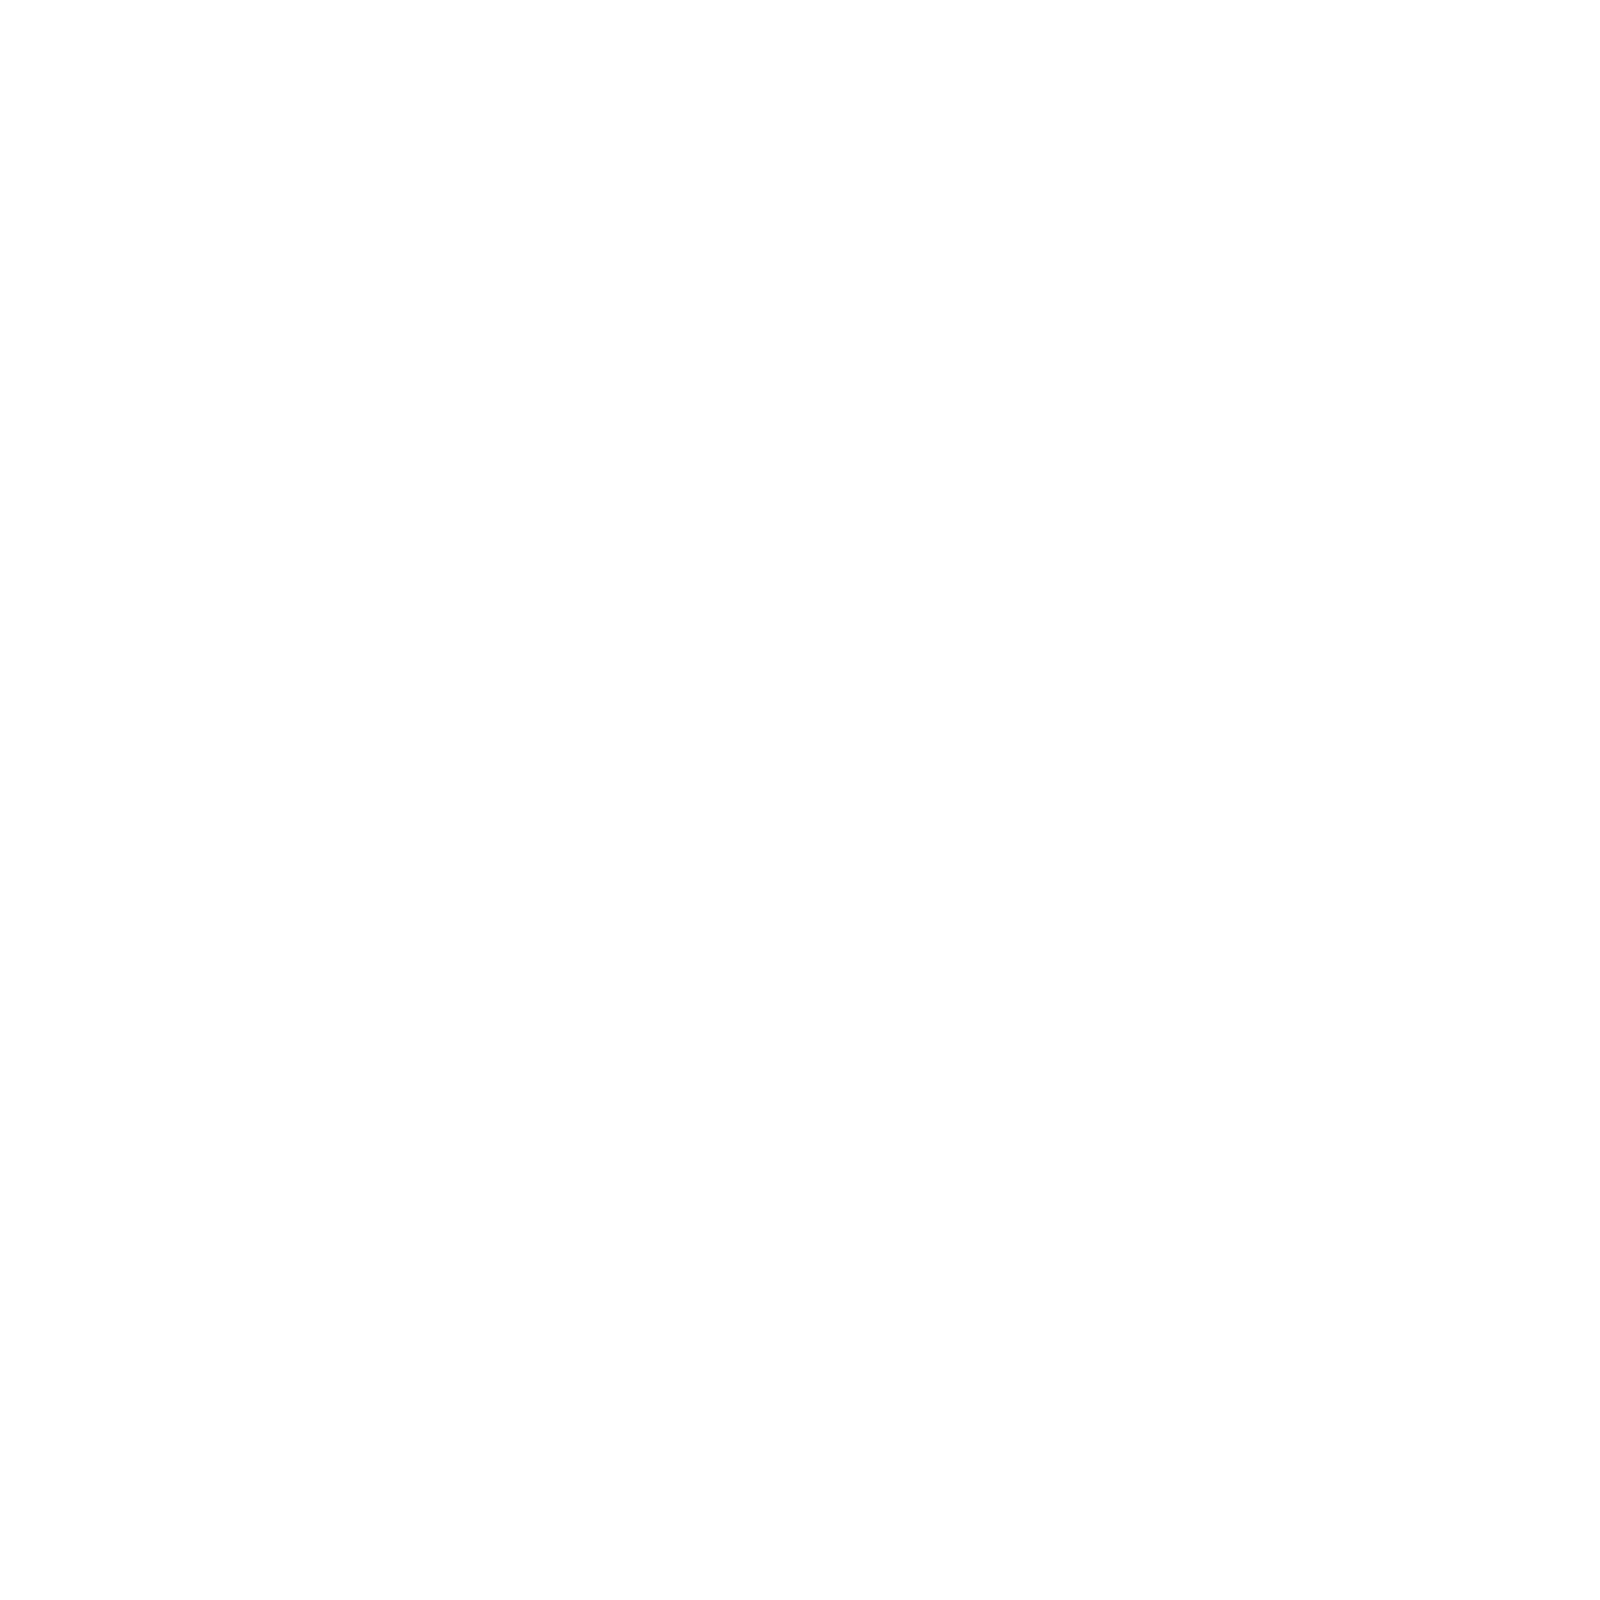 Slider-Transparent-1600x1600